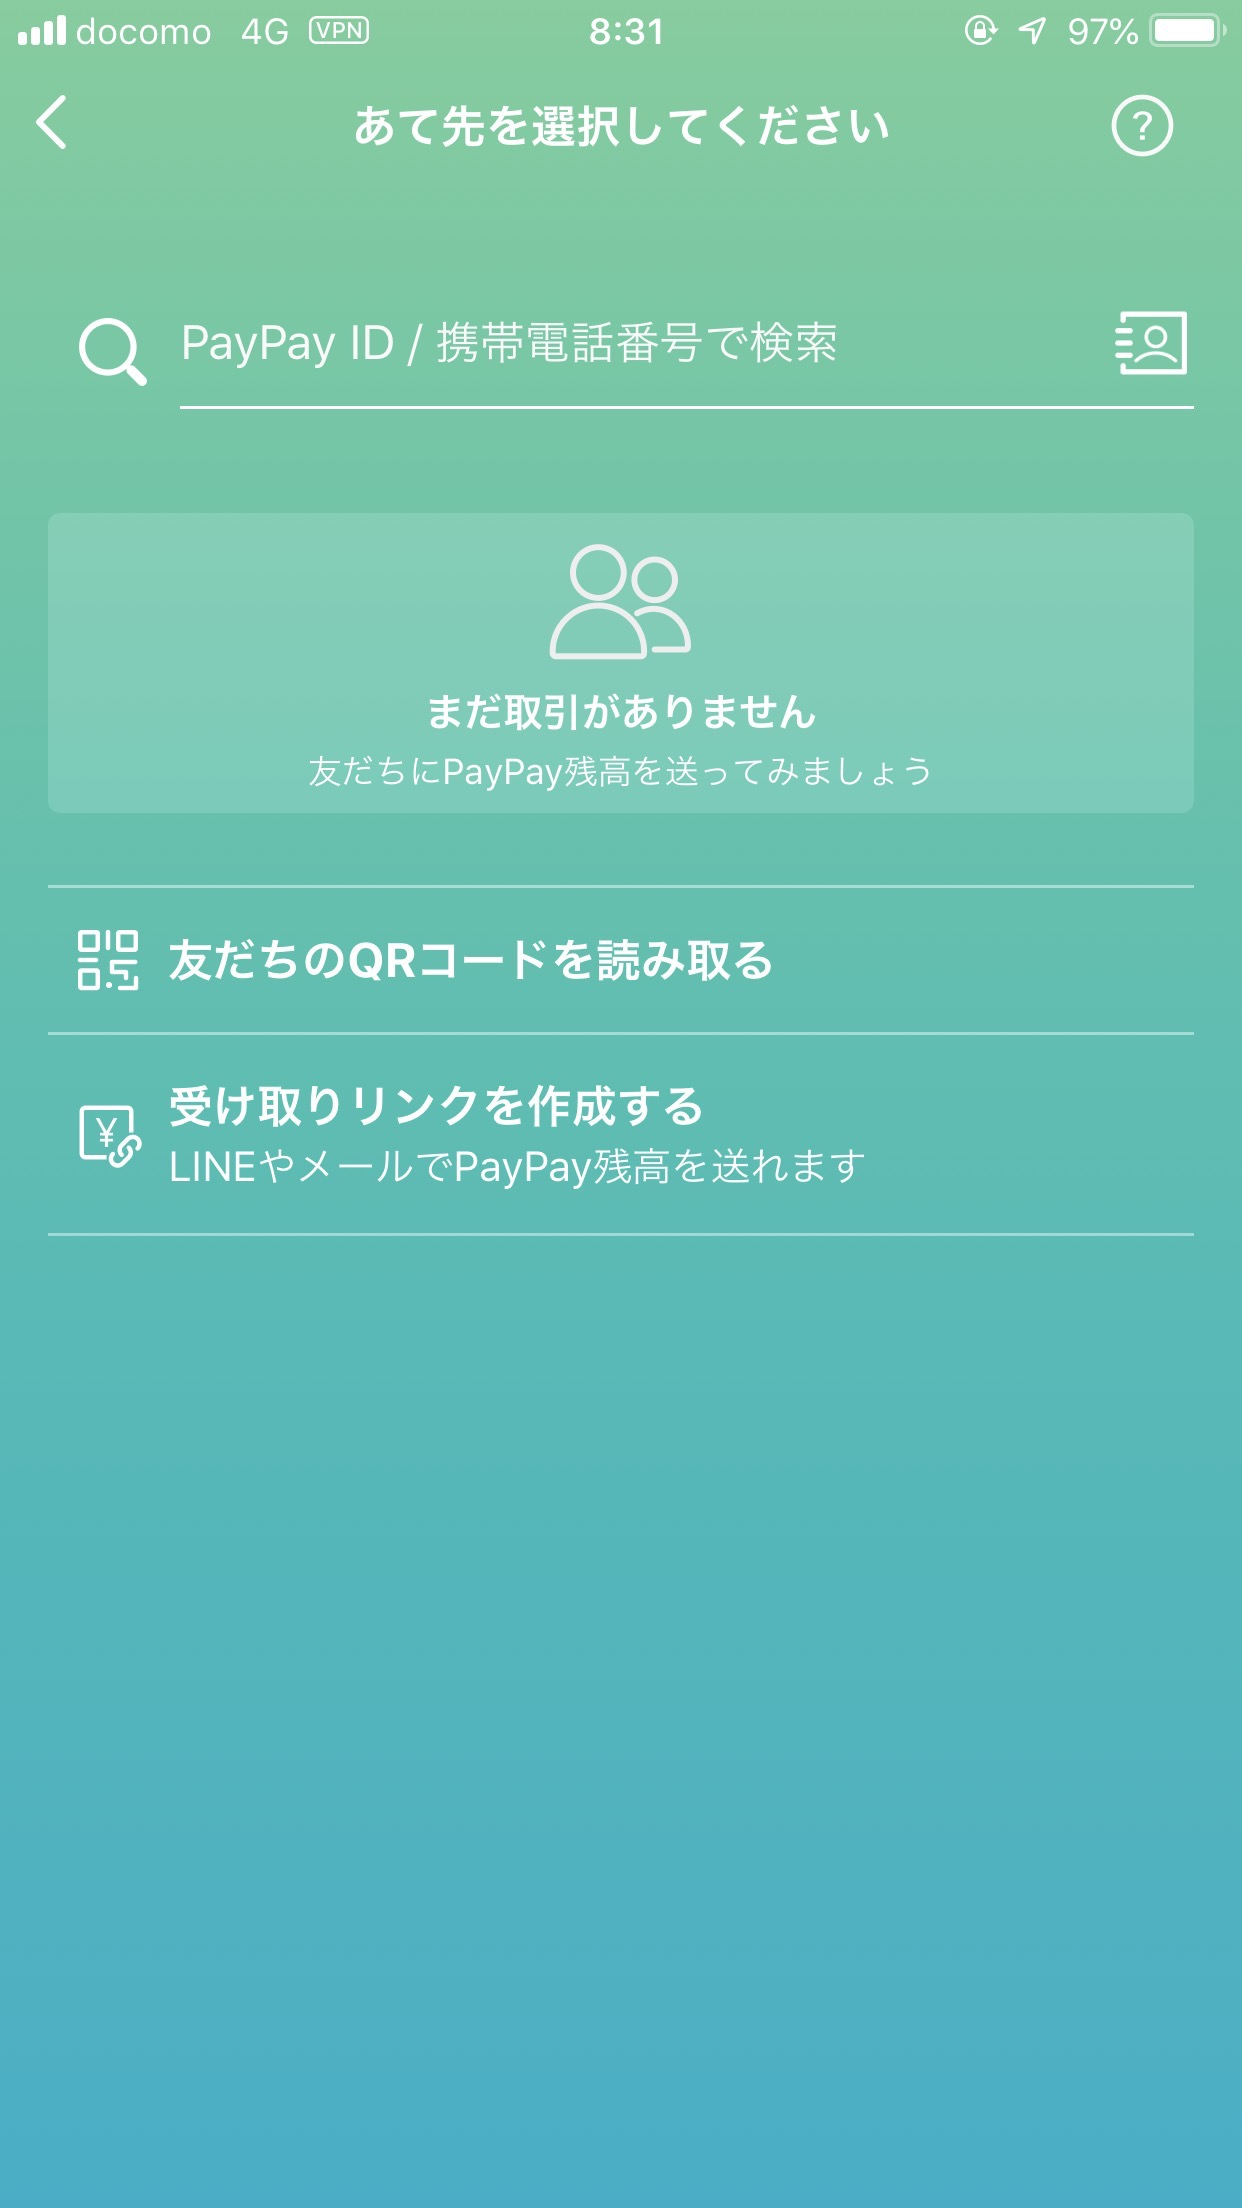 【PayPay】送金可能な「PayPay ID」3